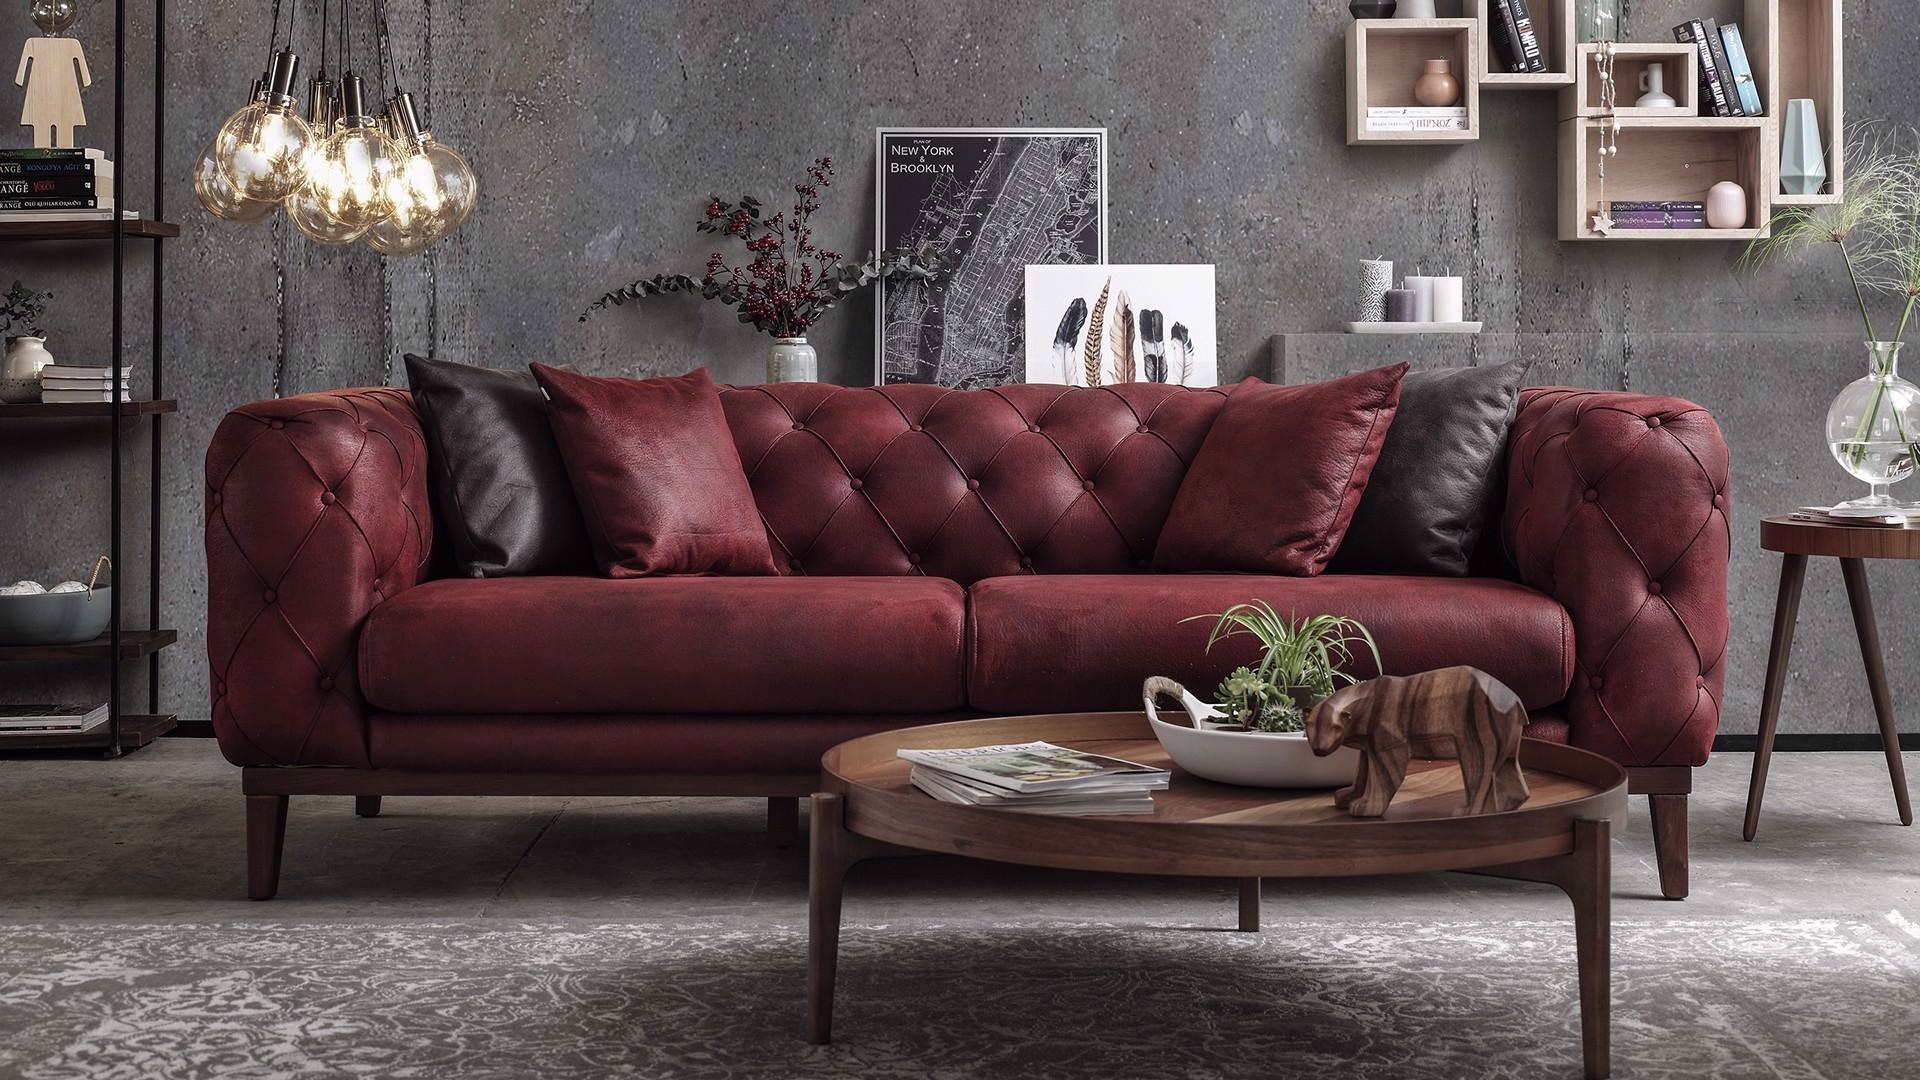 Canapea fixa tapitata cu stofa, 3 locuri Lounge Burgundy, l228xA98xH75 cm